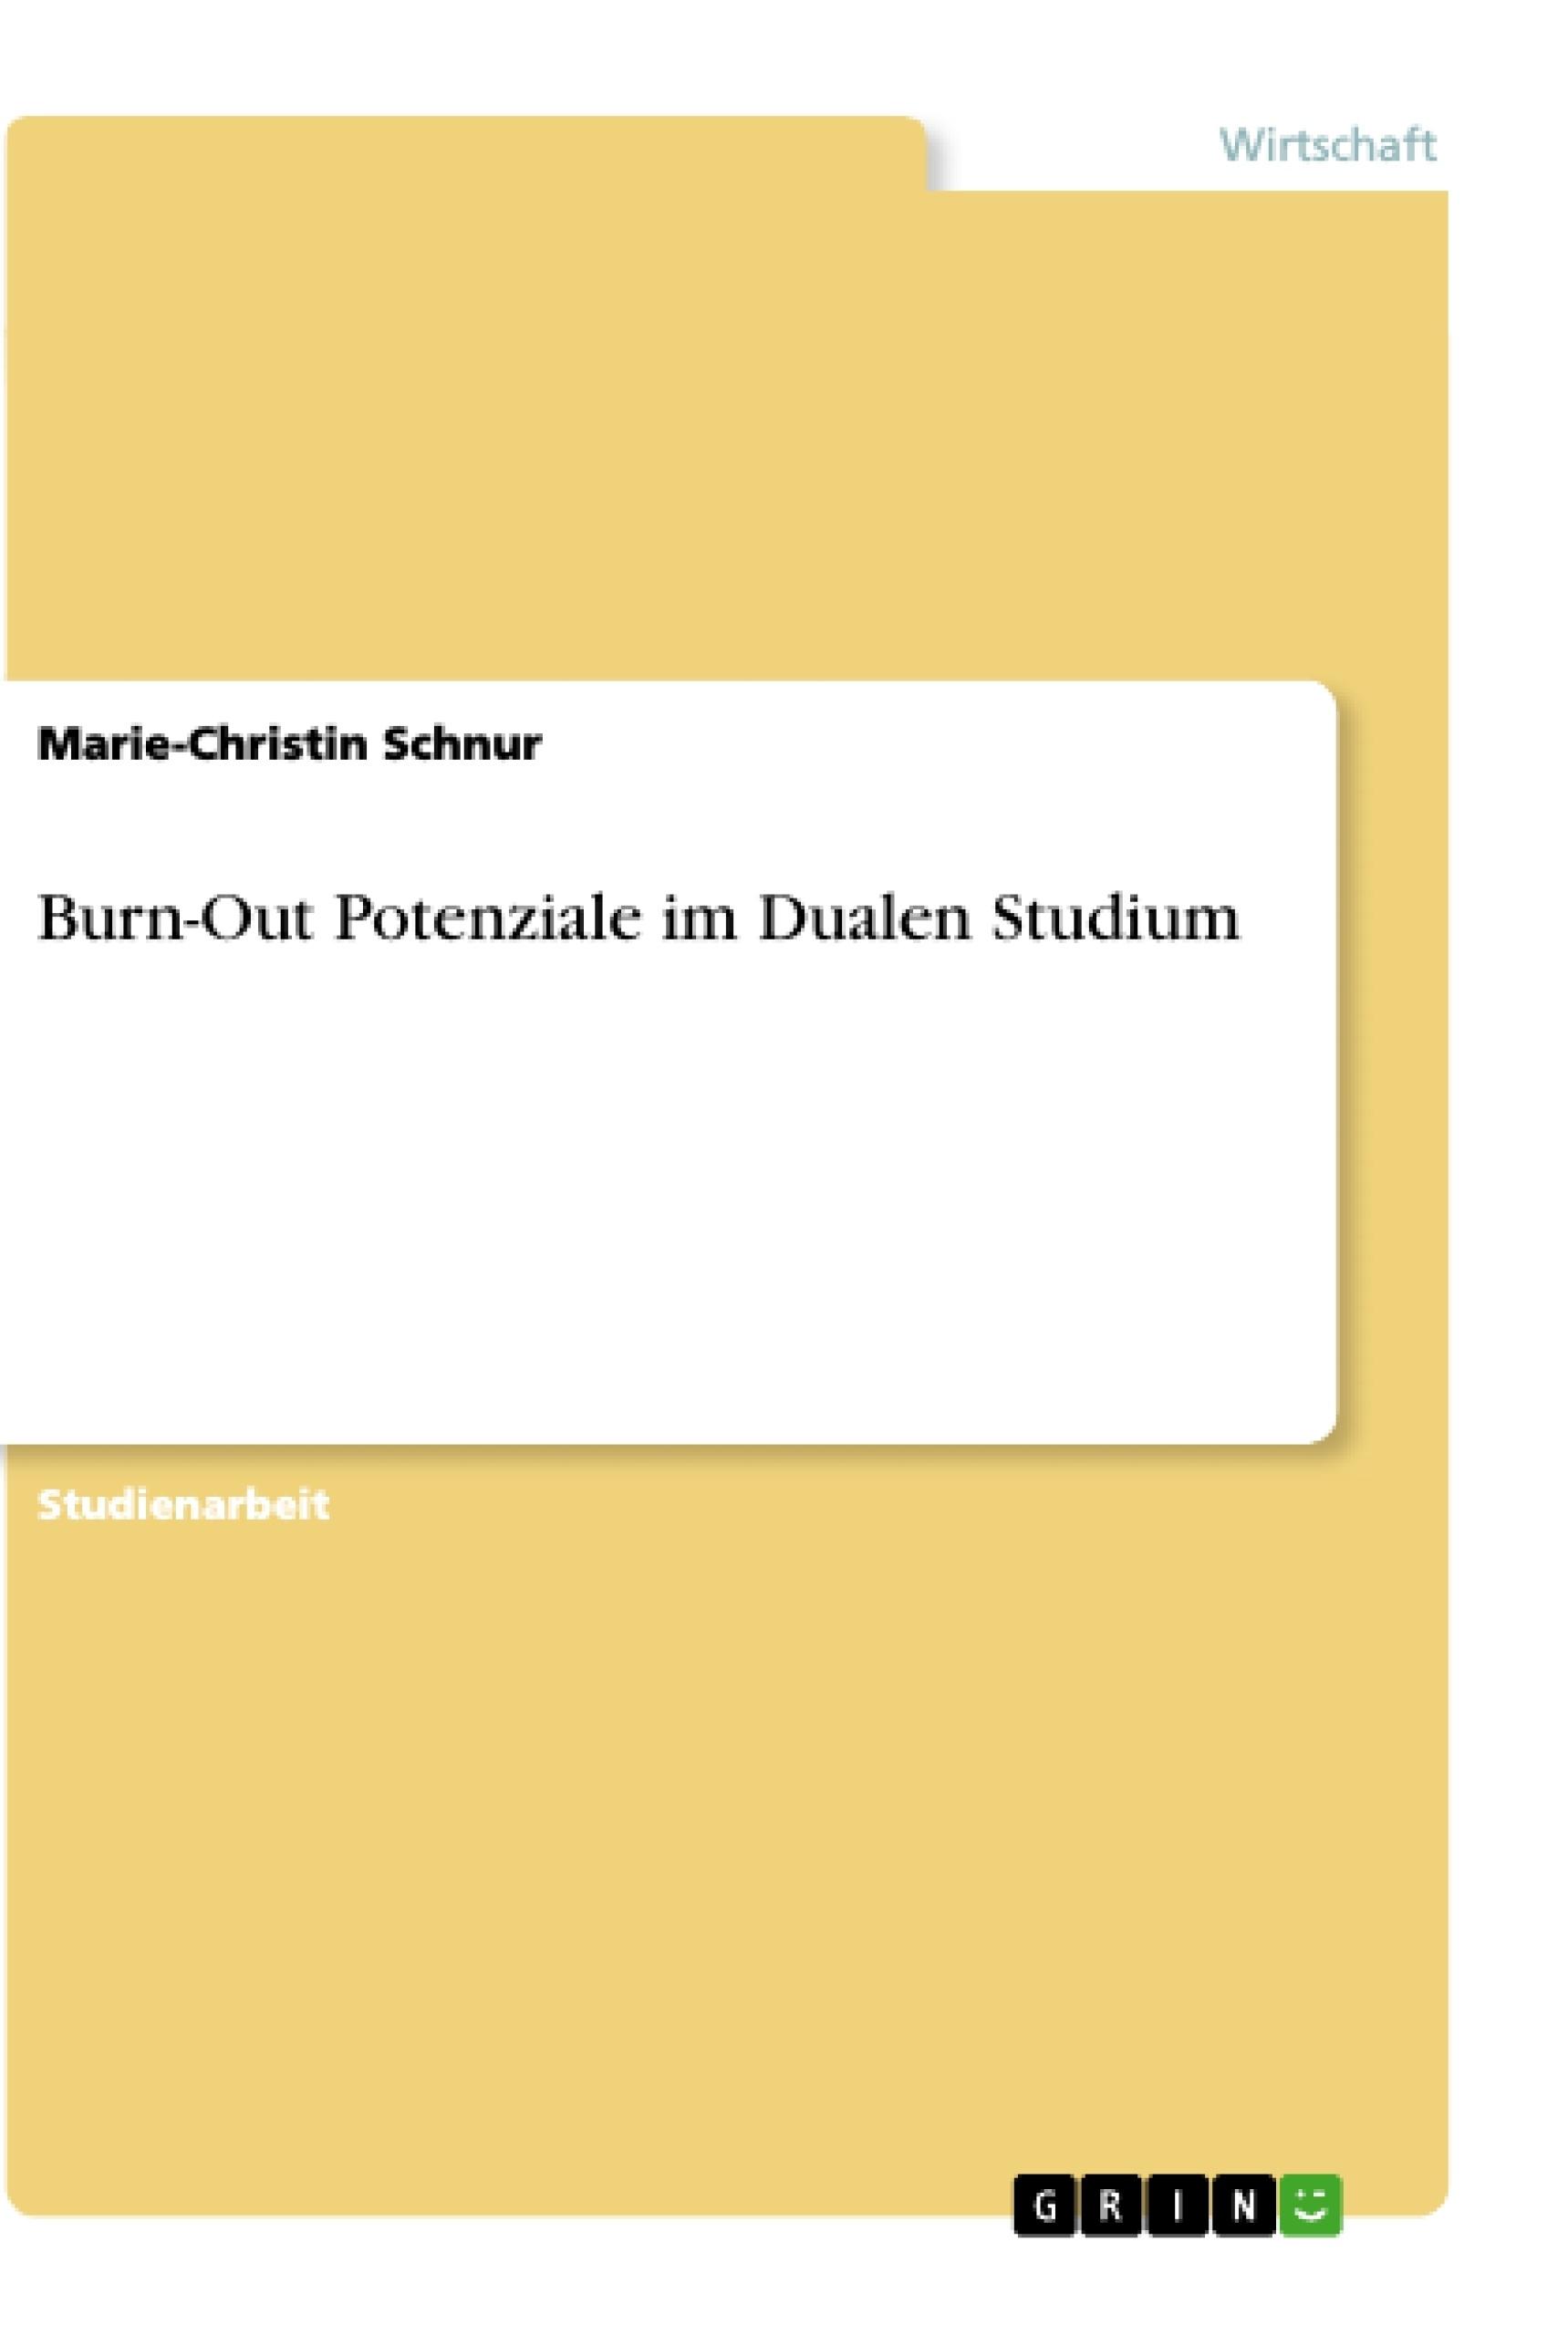 Titel: Burn-Out Potenziale im Dualen Studium